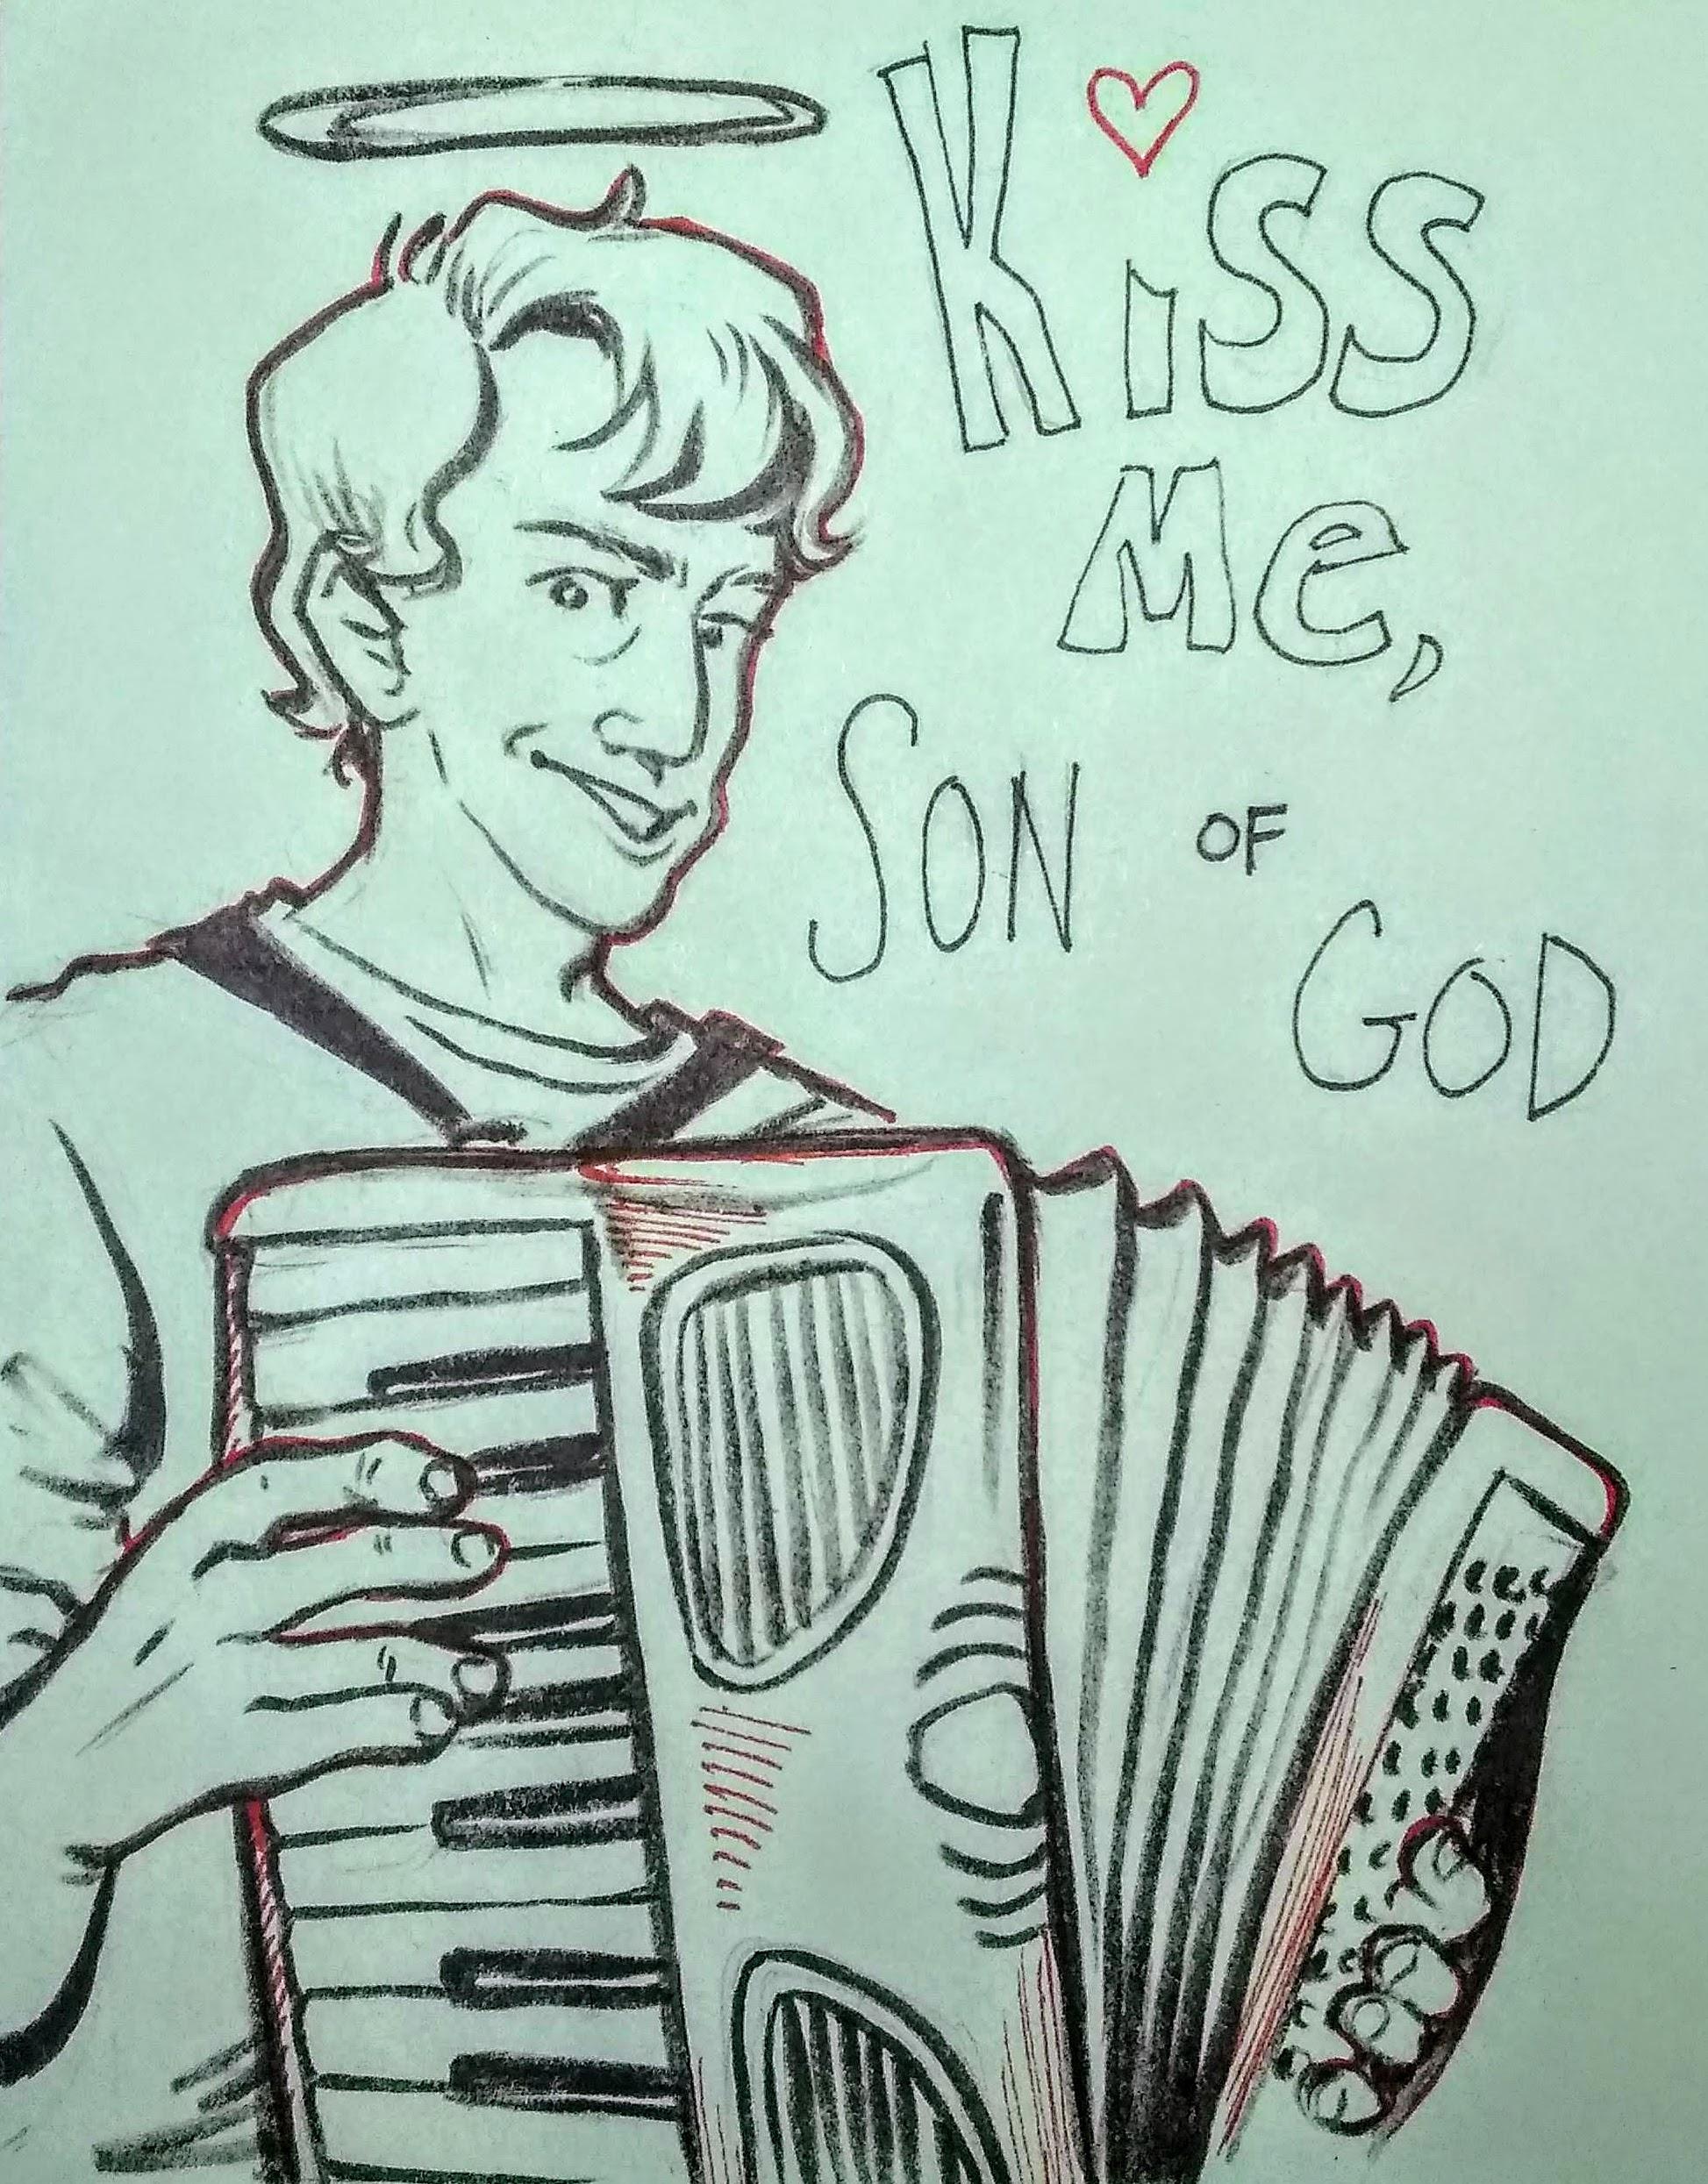 Kiss Me Son of God